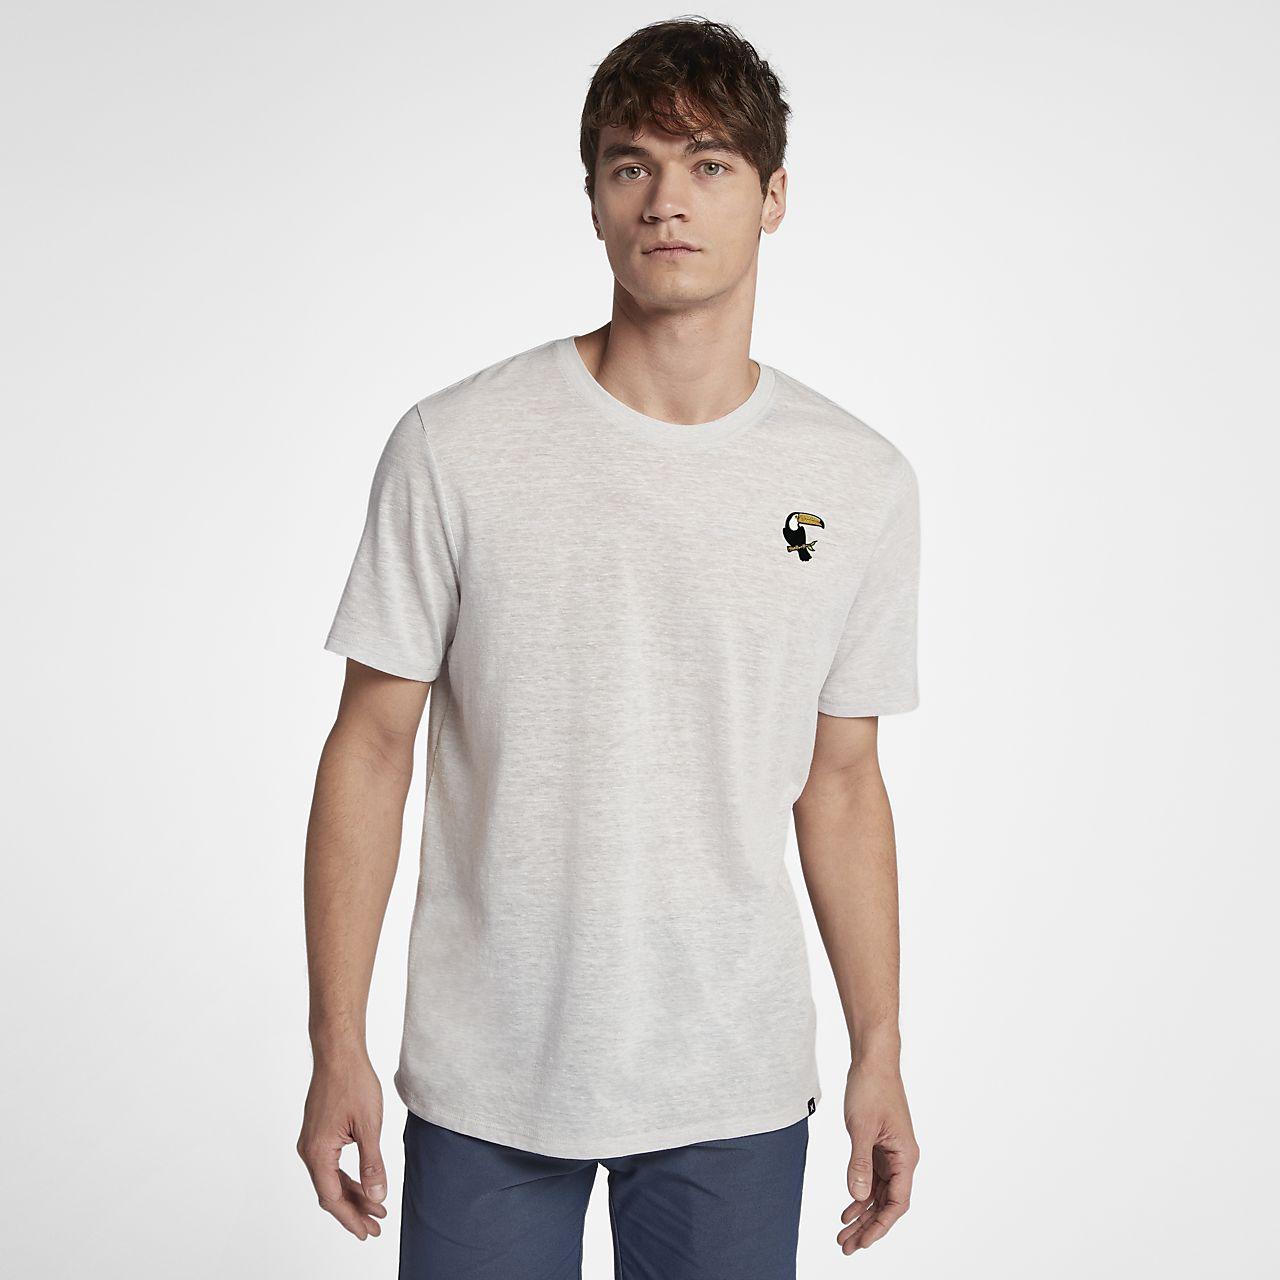 ... Hurley Toucan Tri-Blend Men's T-Shirt